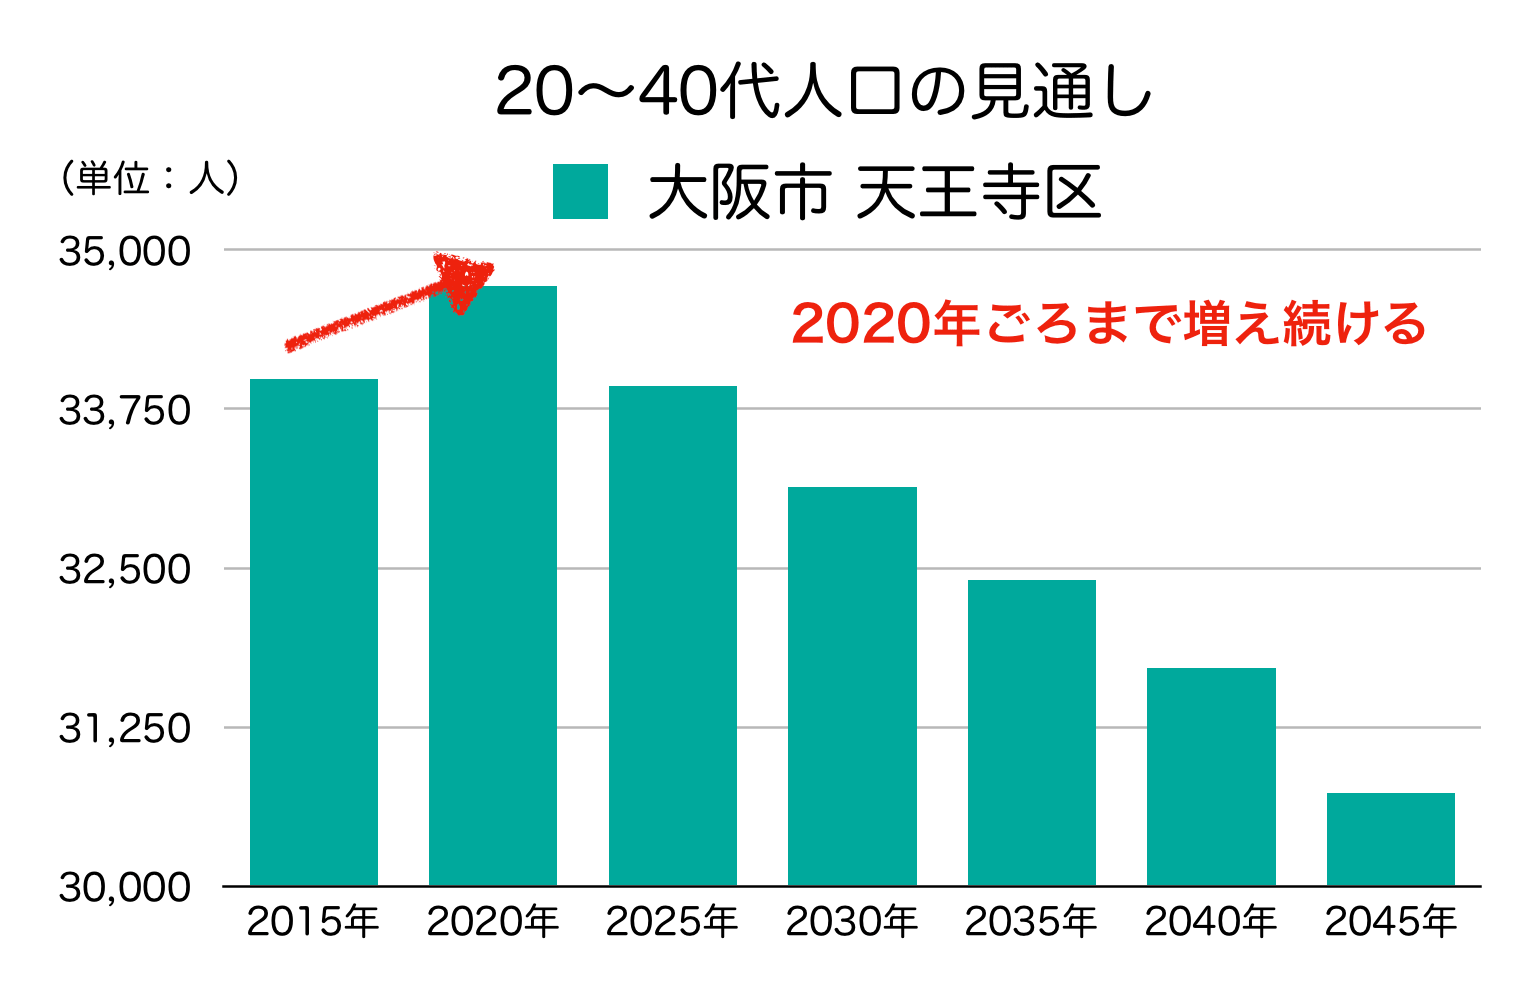 大阪市天王寺区の20〜40代人口の予測